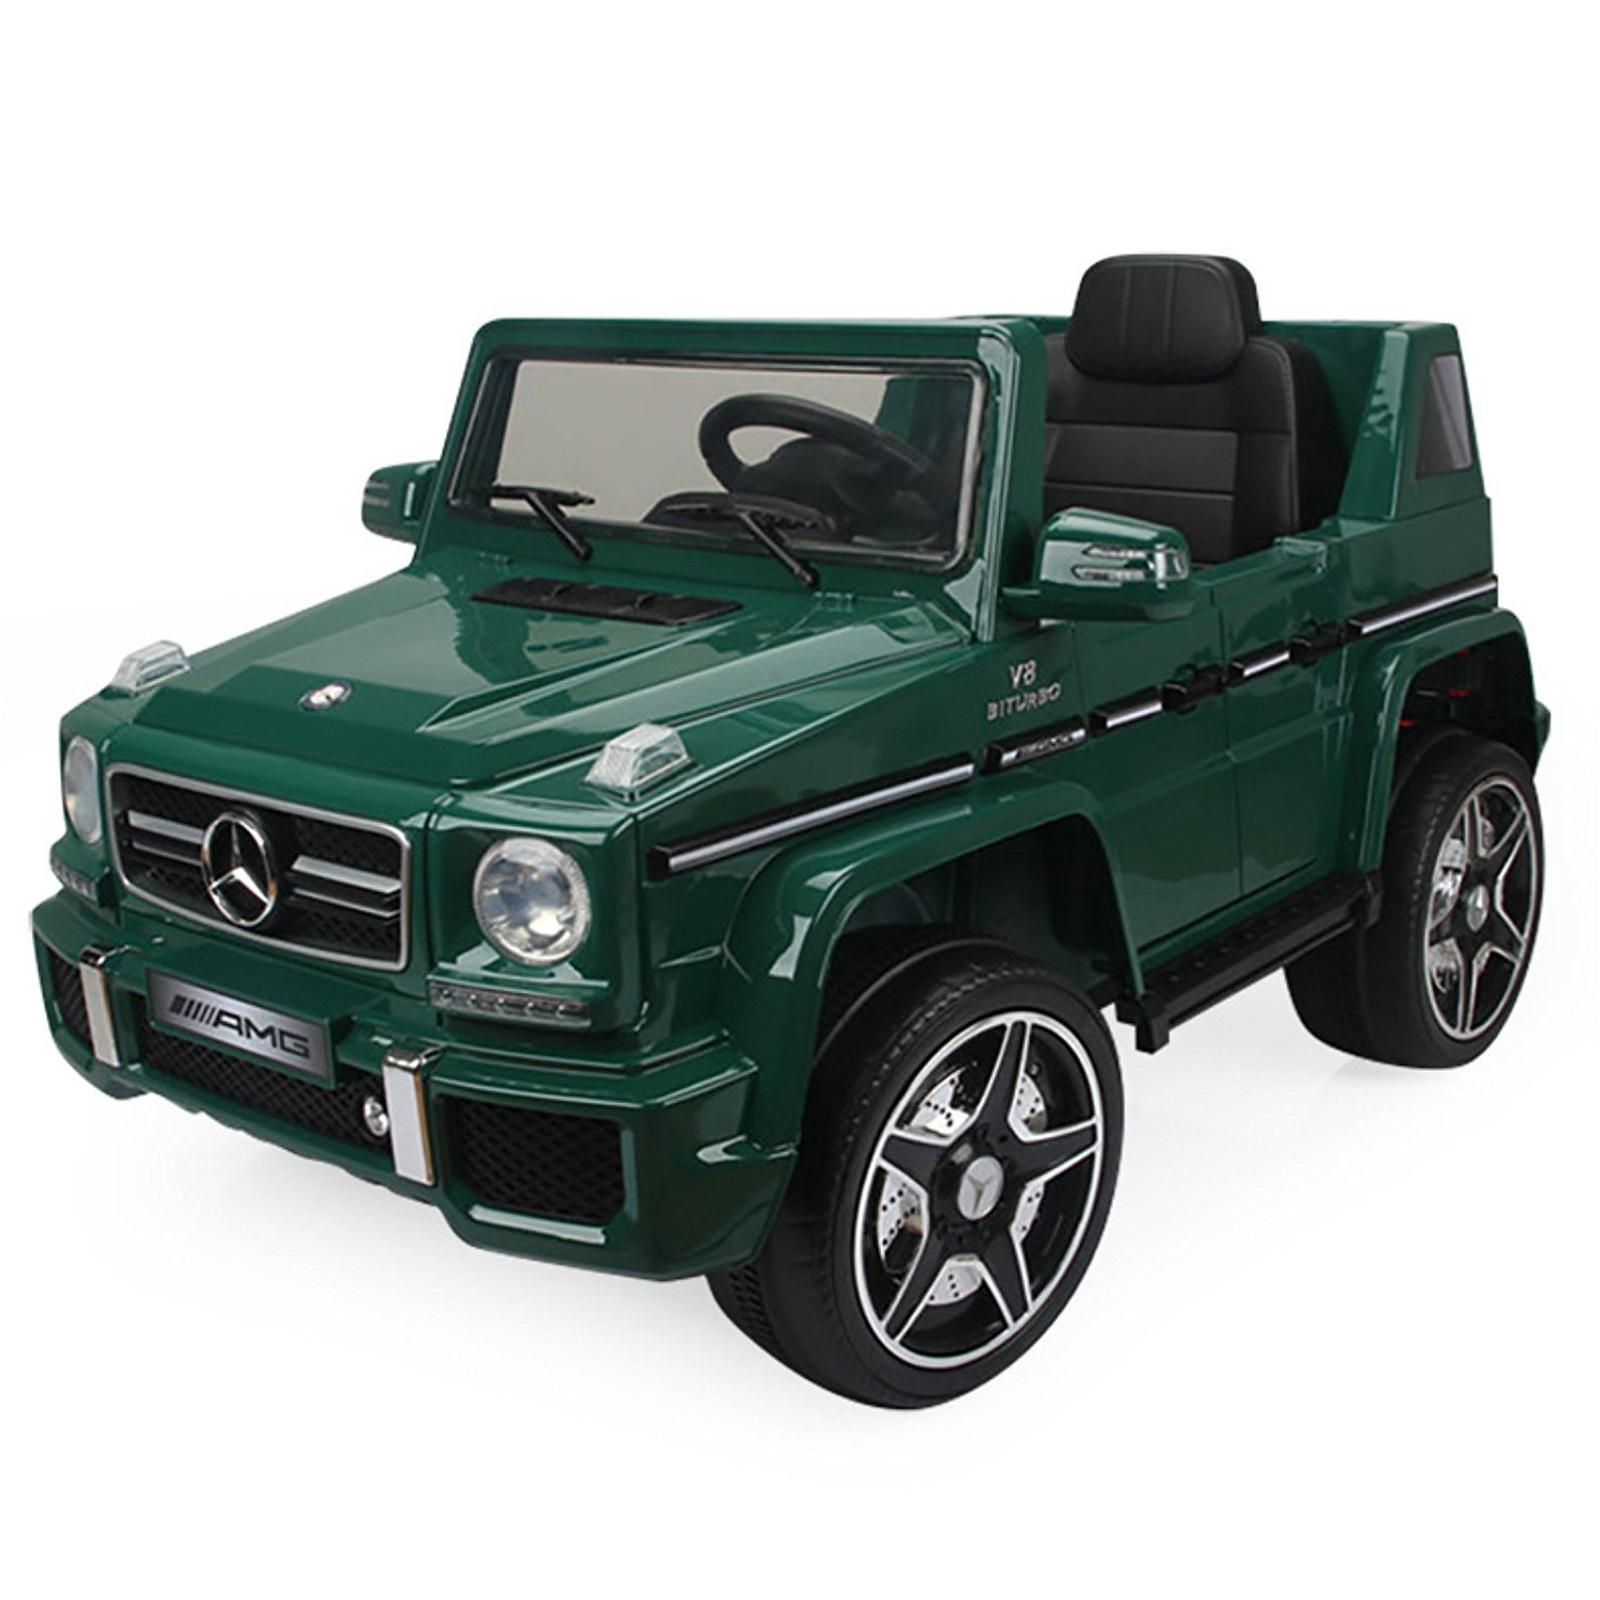 Mercedes G-63 12V Kids Ride On Car - Green